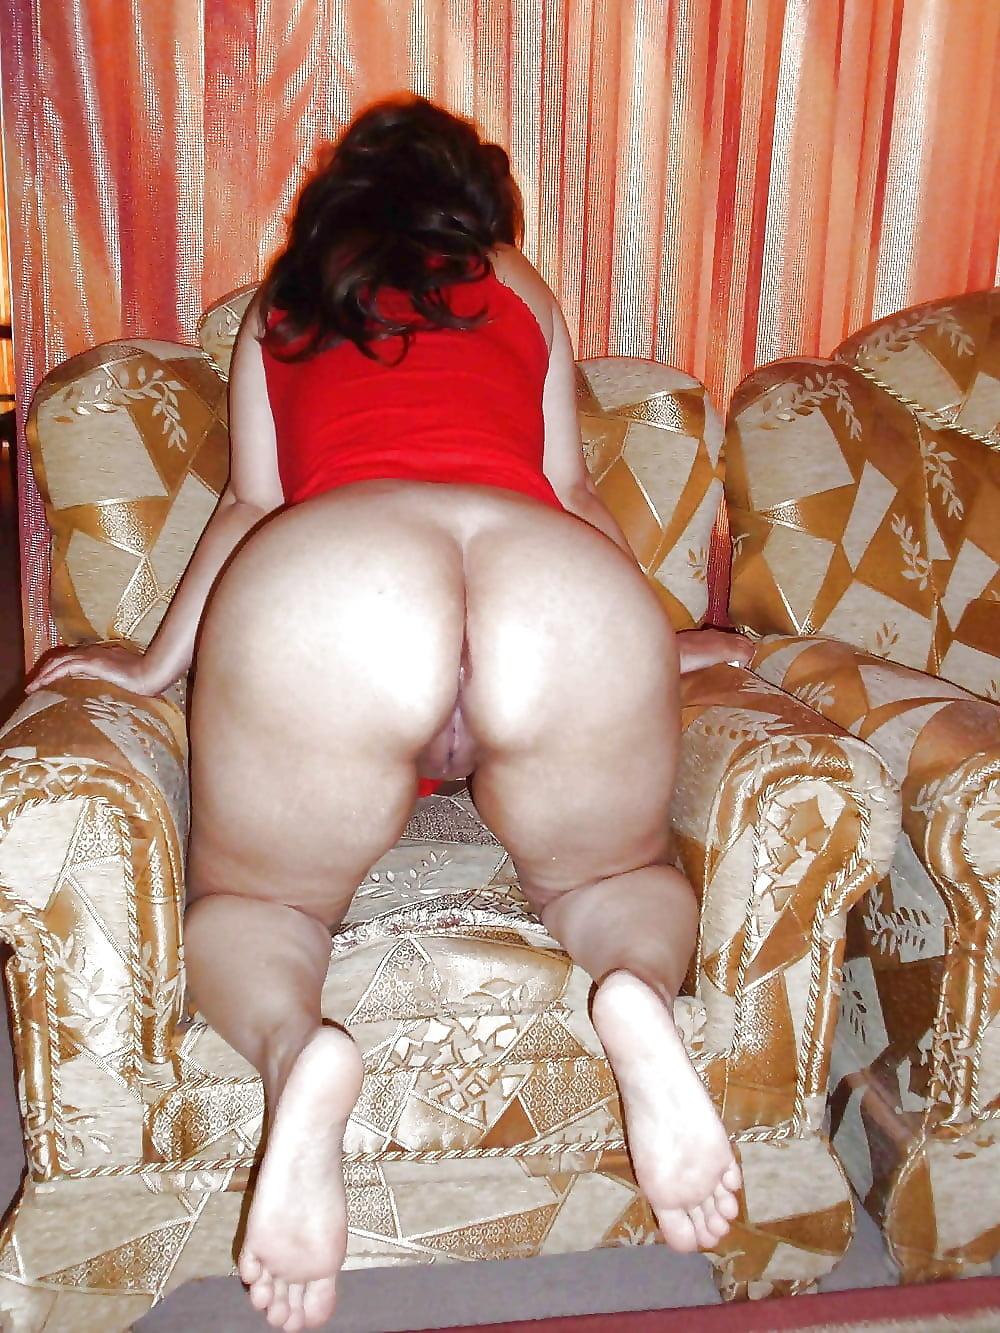 Gangbang scene turkish mature wife nude